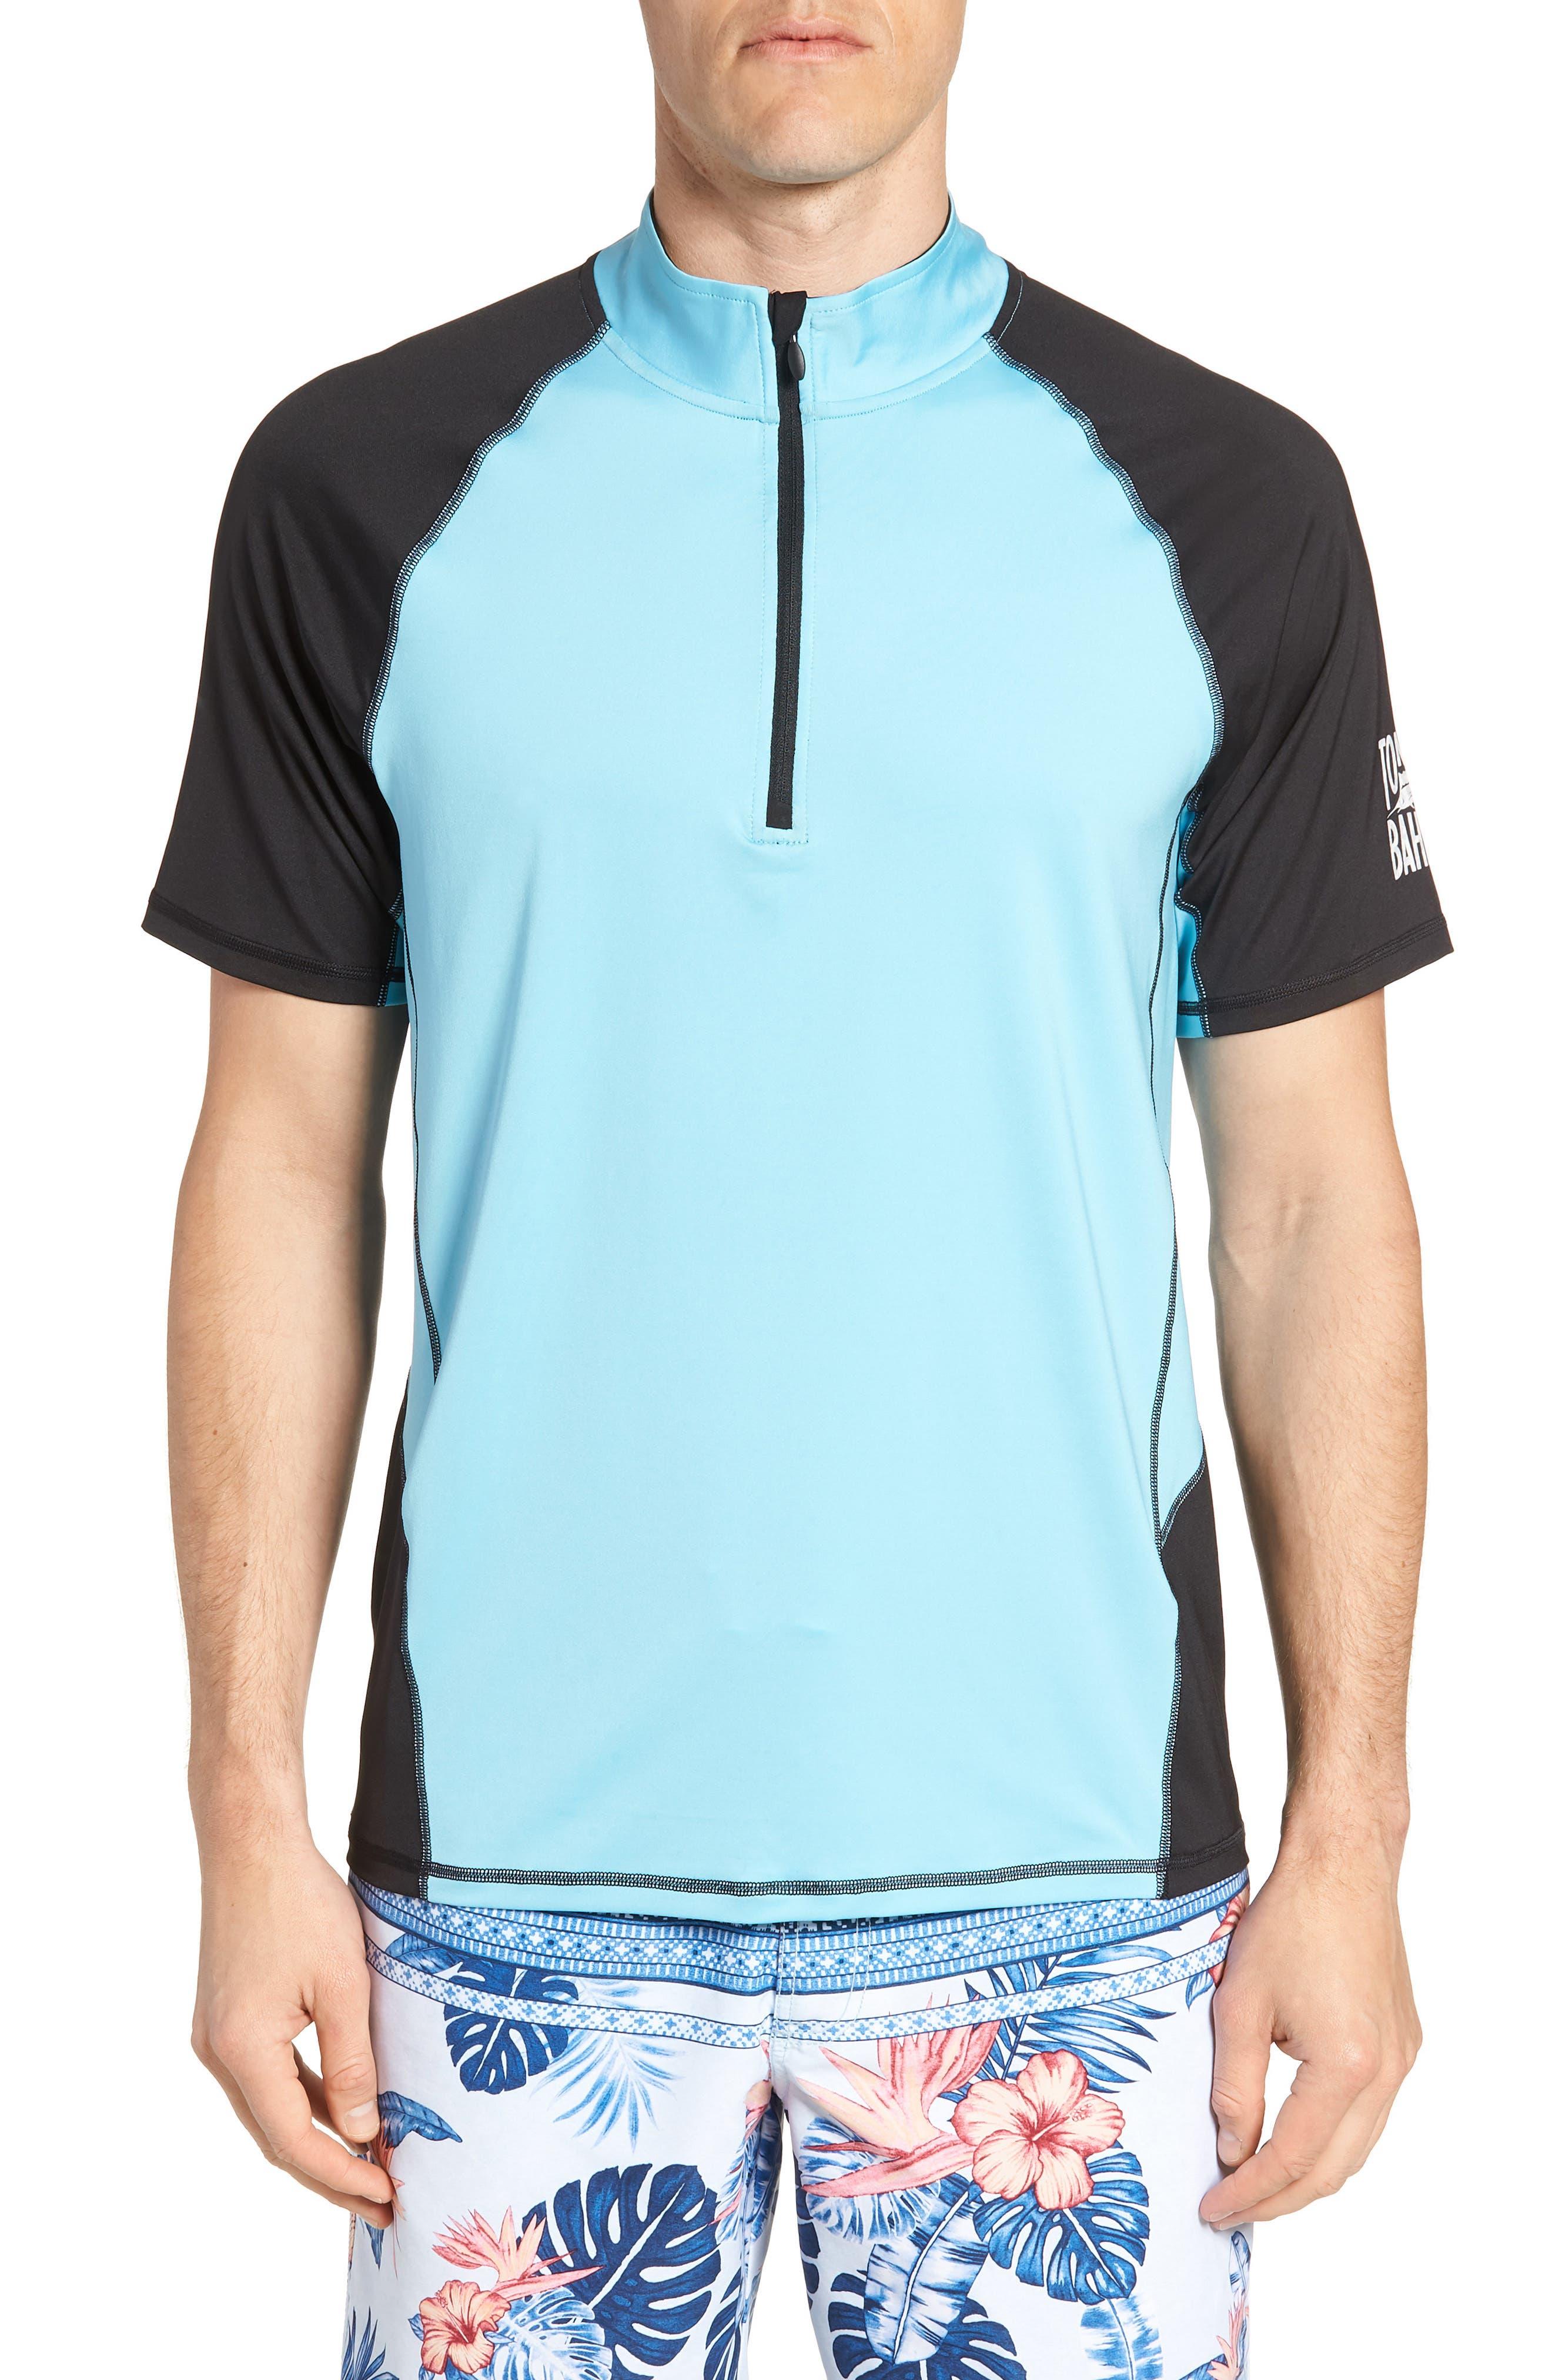 IslandActive<sup>™</sup> Colorblock Beach Pro Rashguard T-Shirt,                             Main thumbnail 1, color,                             400